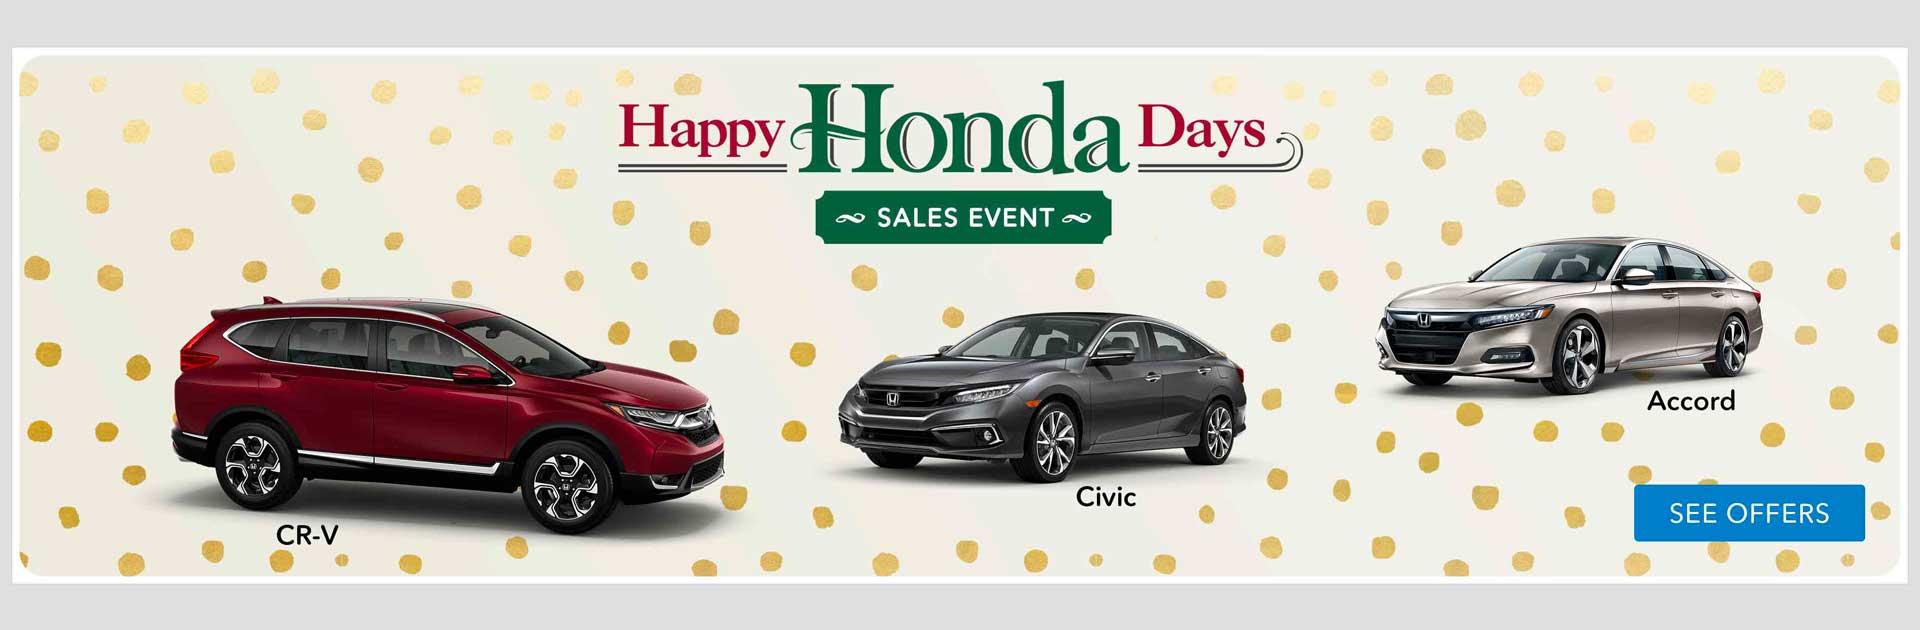 Happy Honda Days Banner